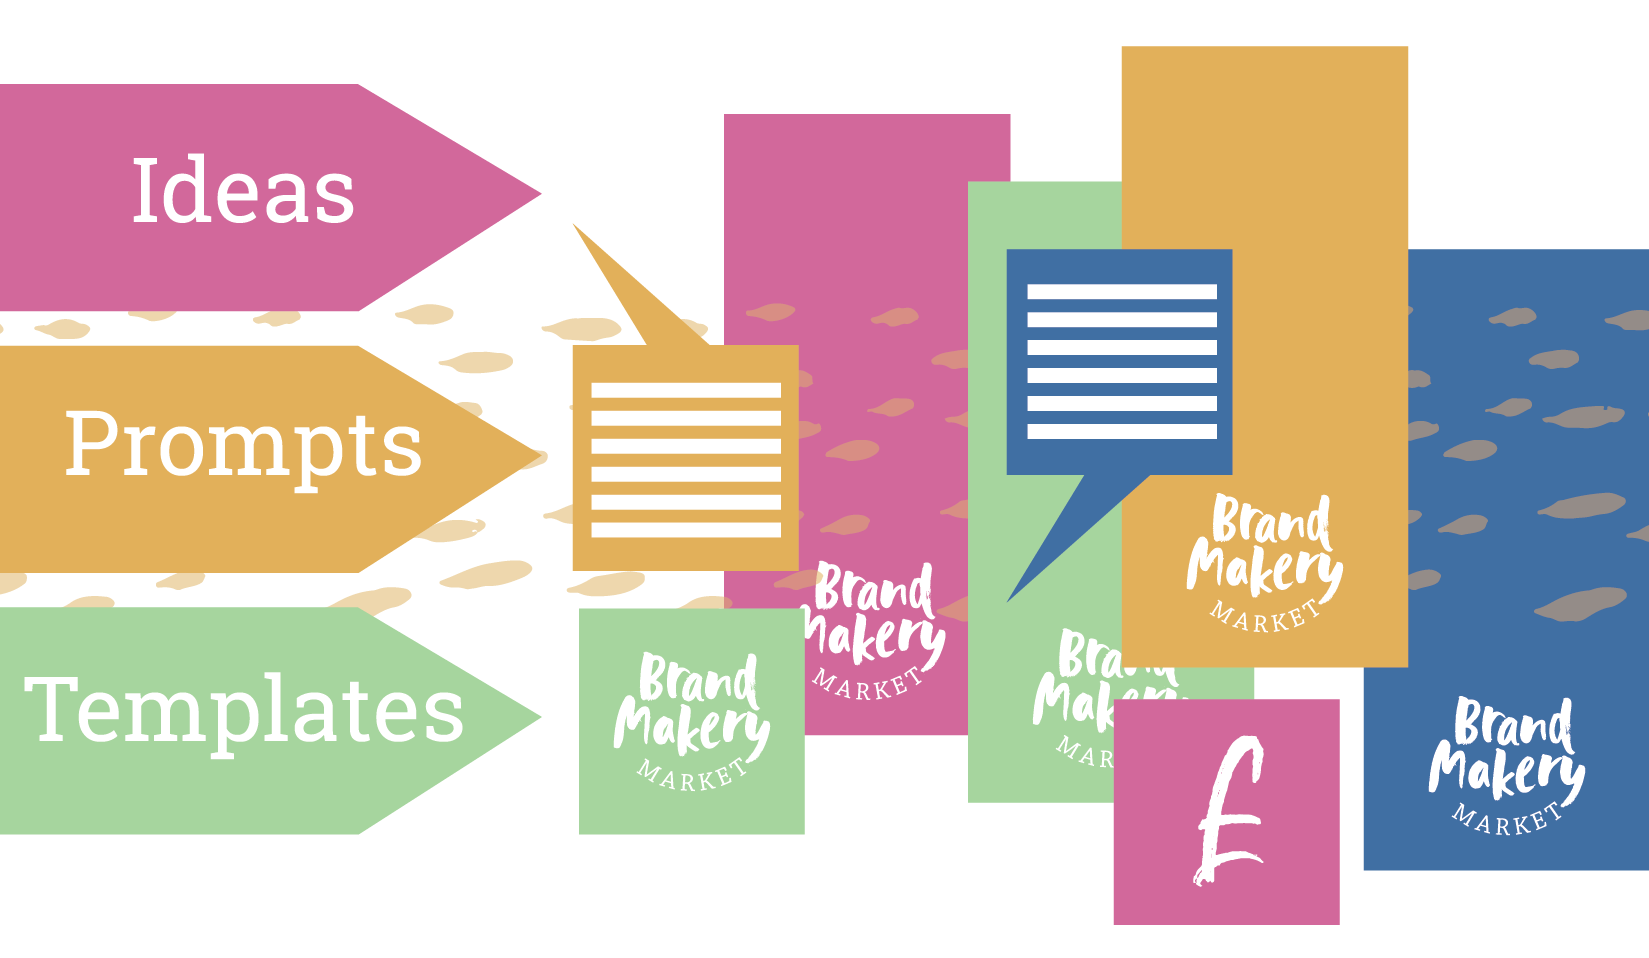 Ideas, prompts, templates